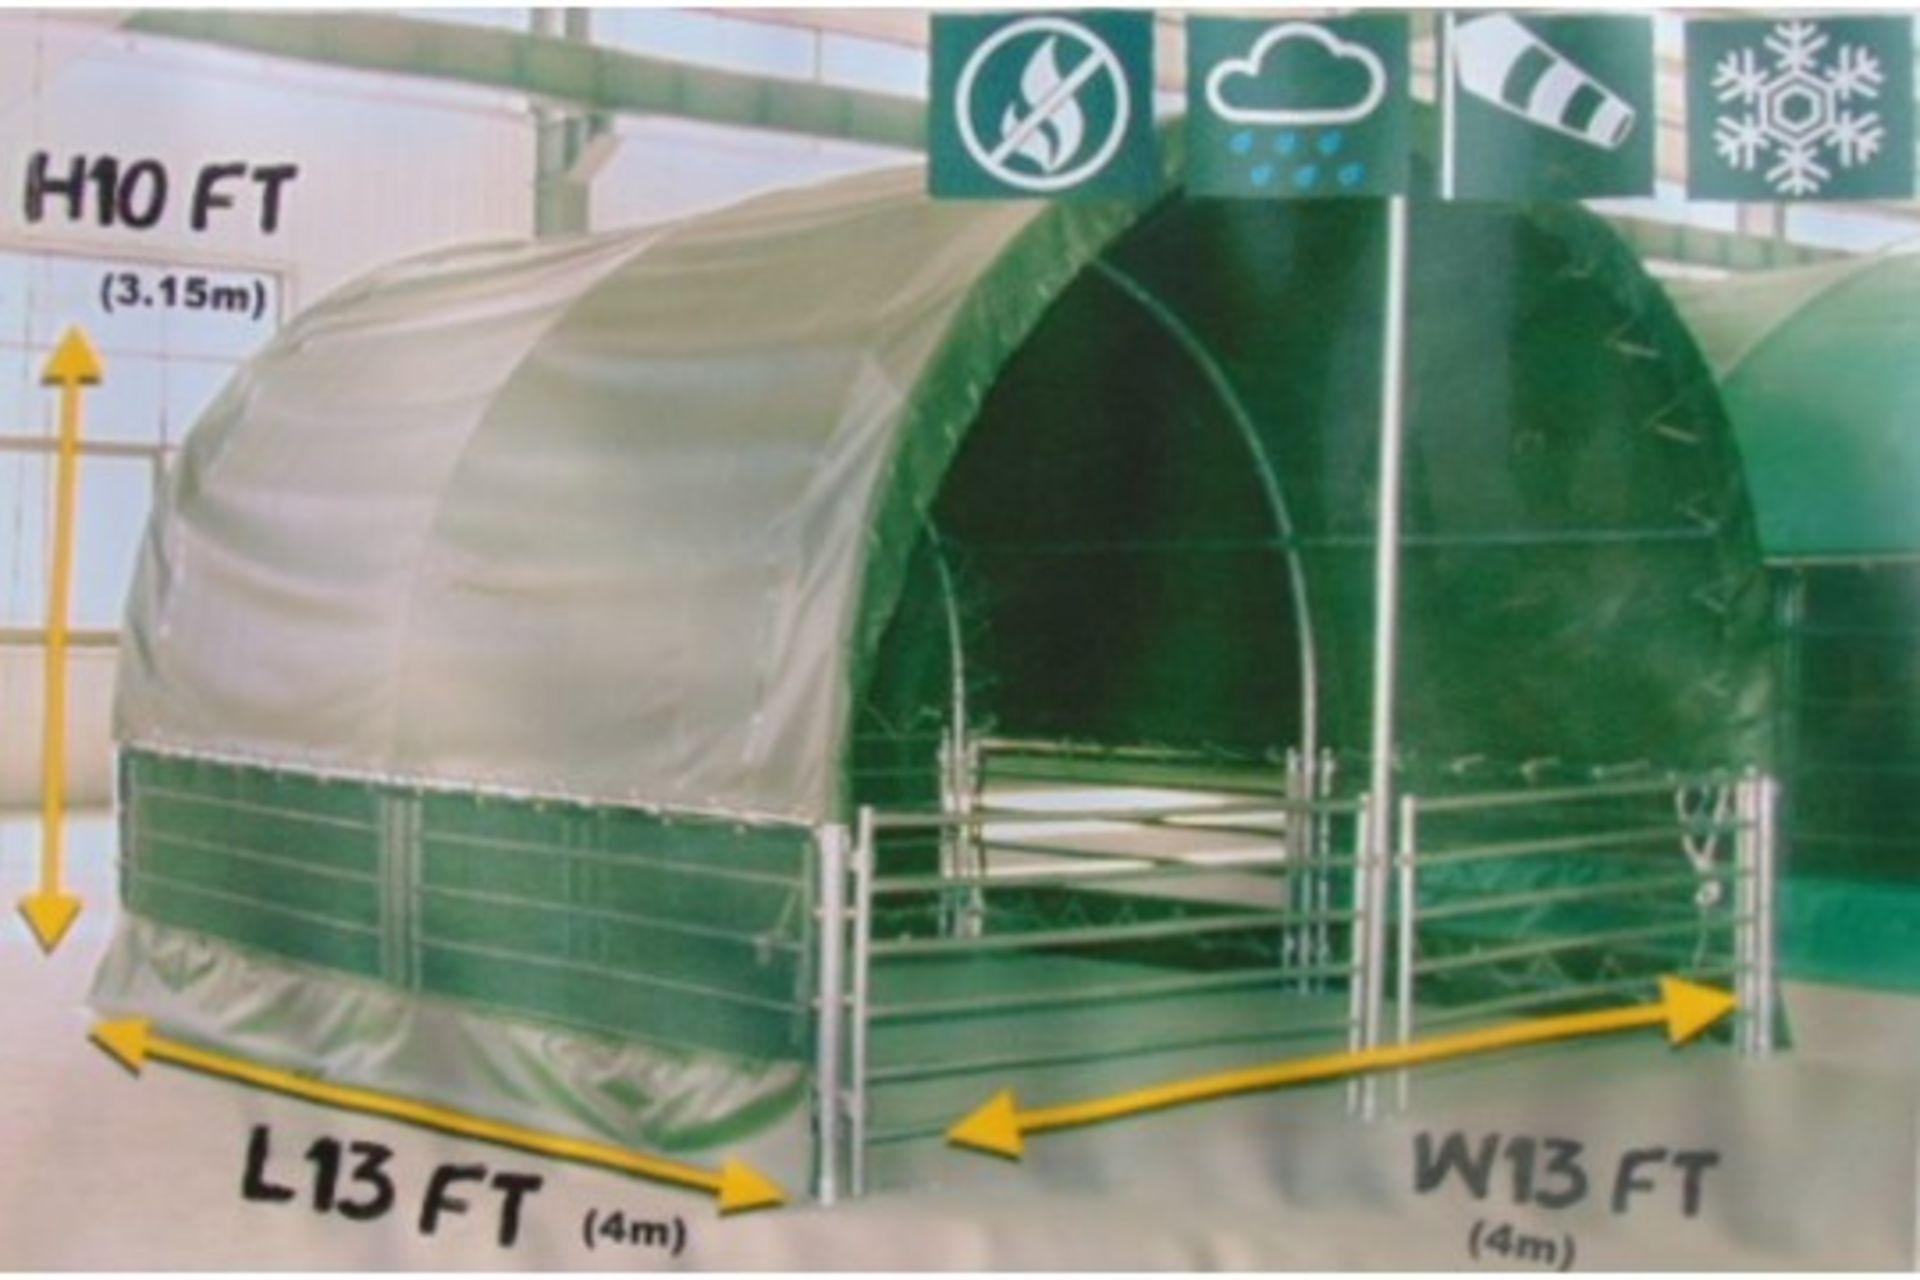 Lot 26811 - Heavy Duty Gated Livestock Shelter 13'W x 13'L x 10' H P/No LS1313